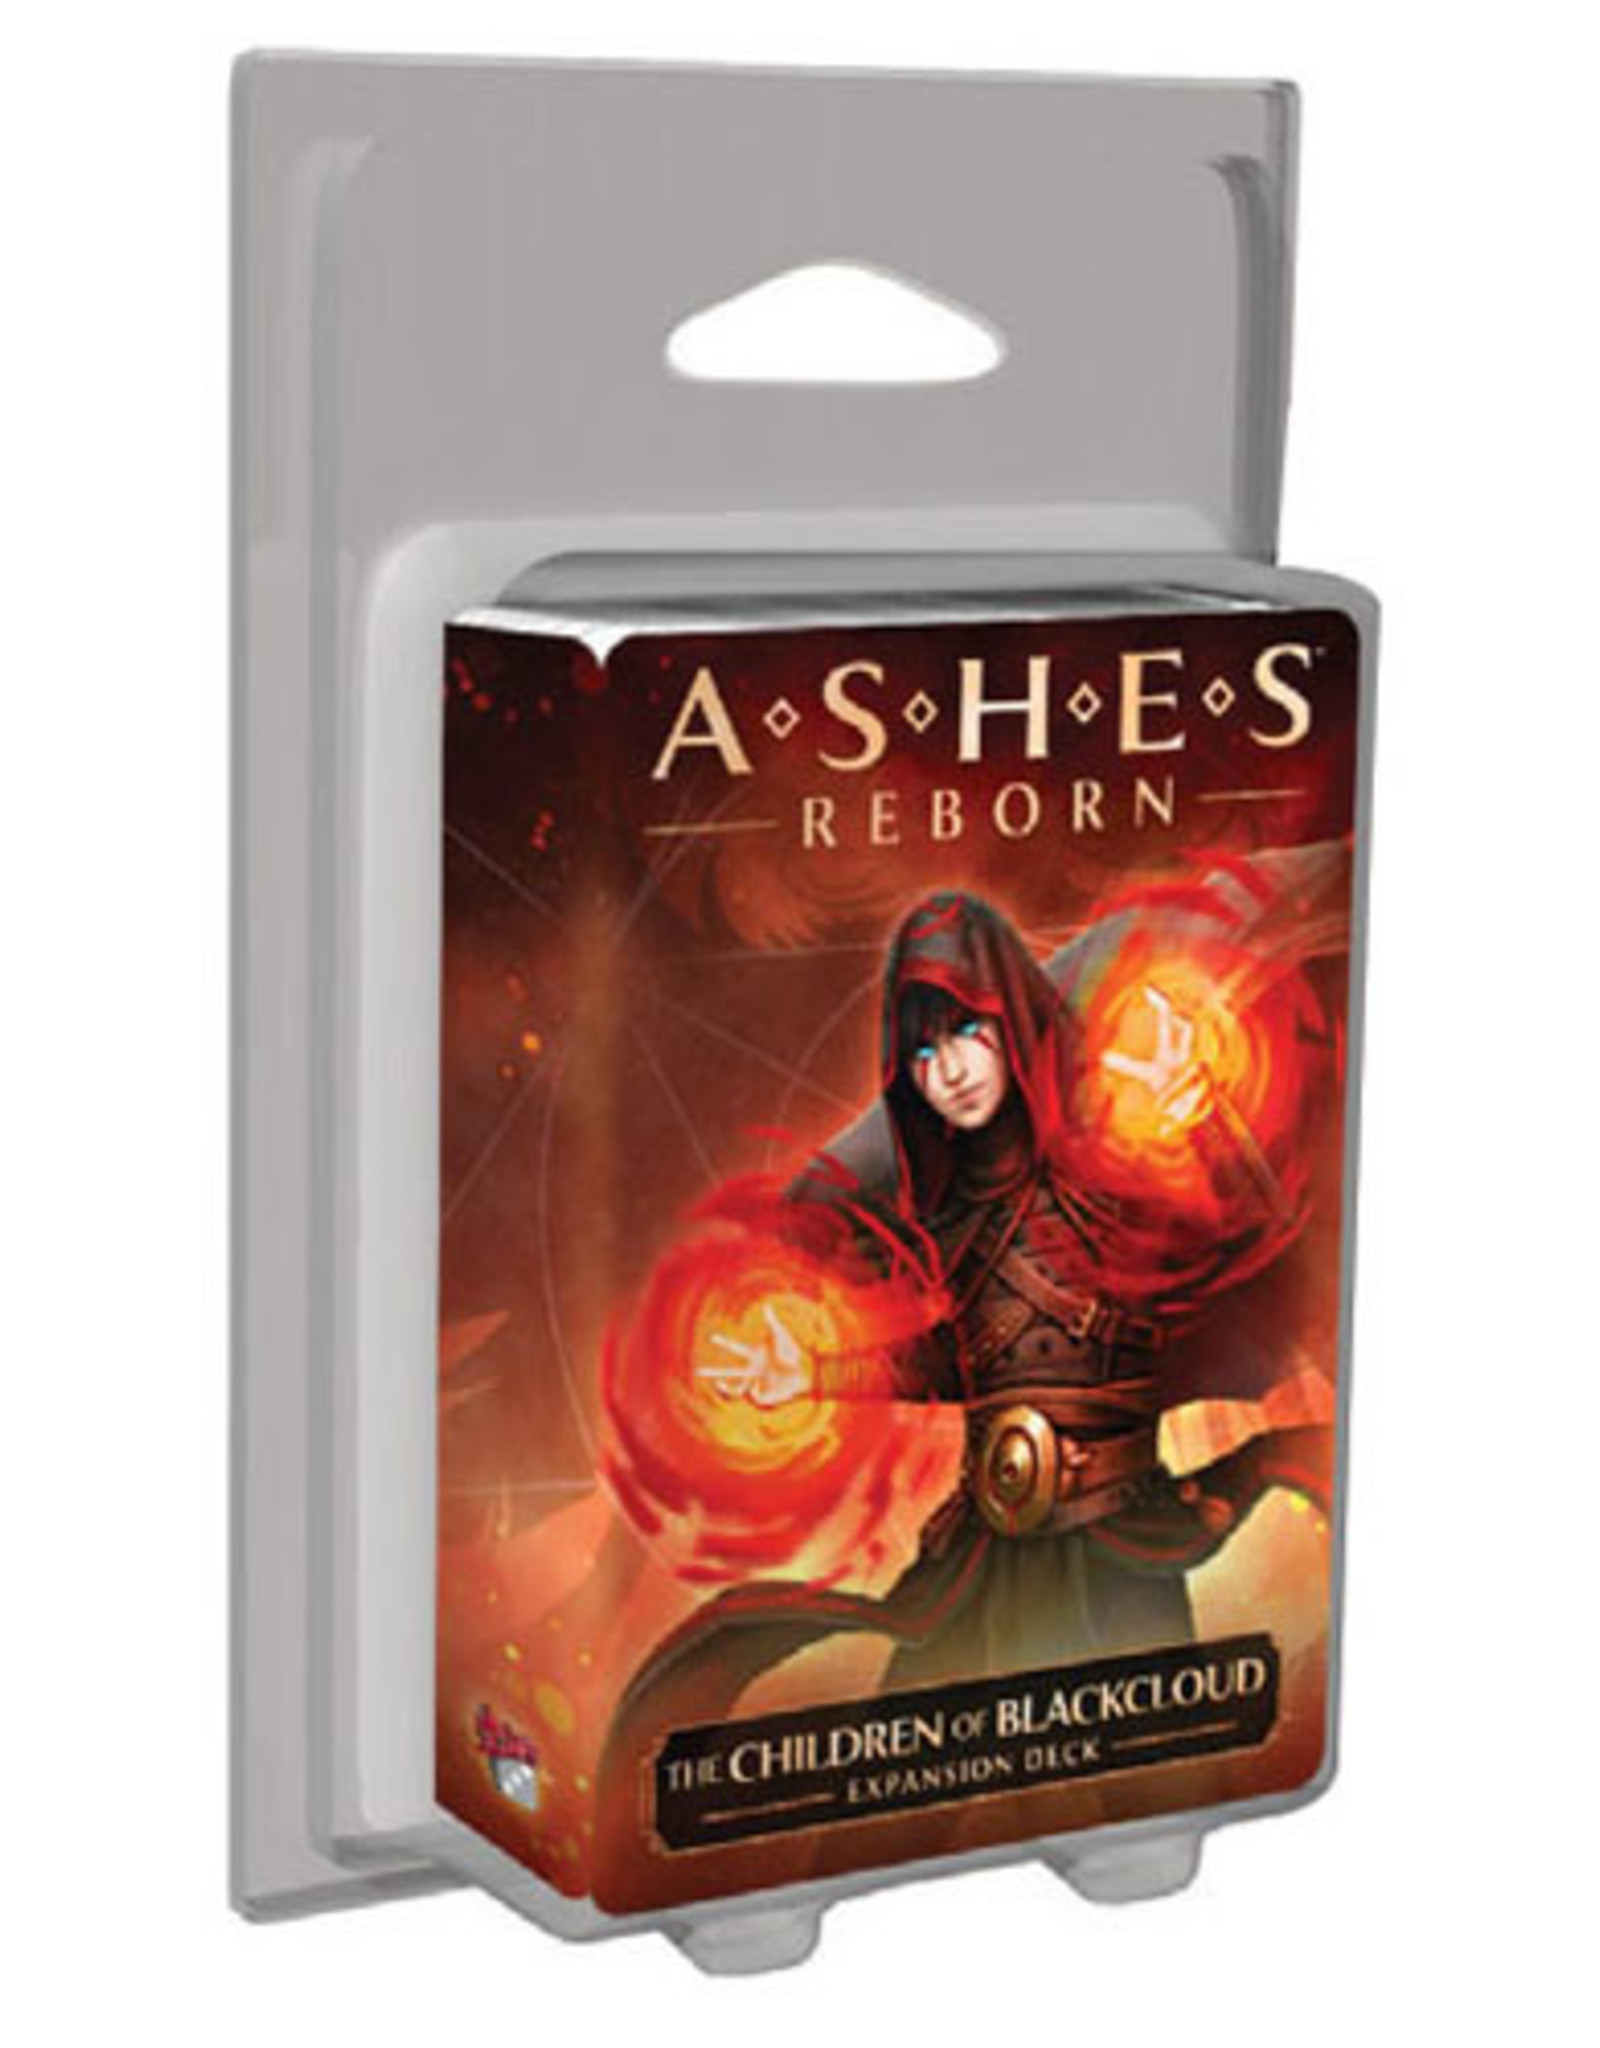 Ashes Reborn The Children of Blackcloud